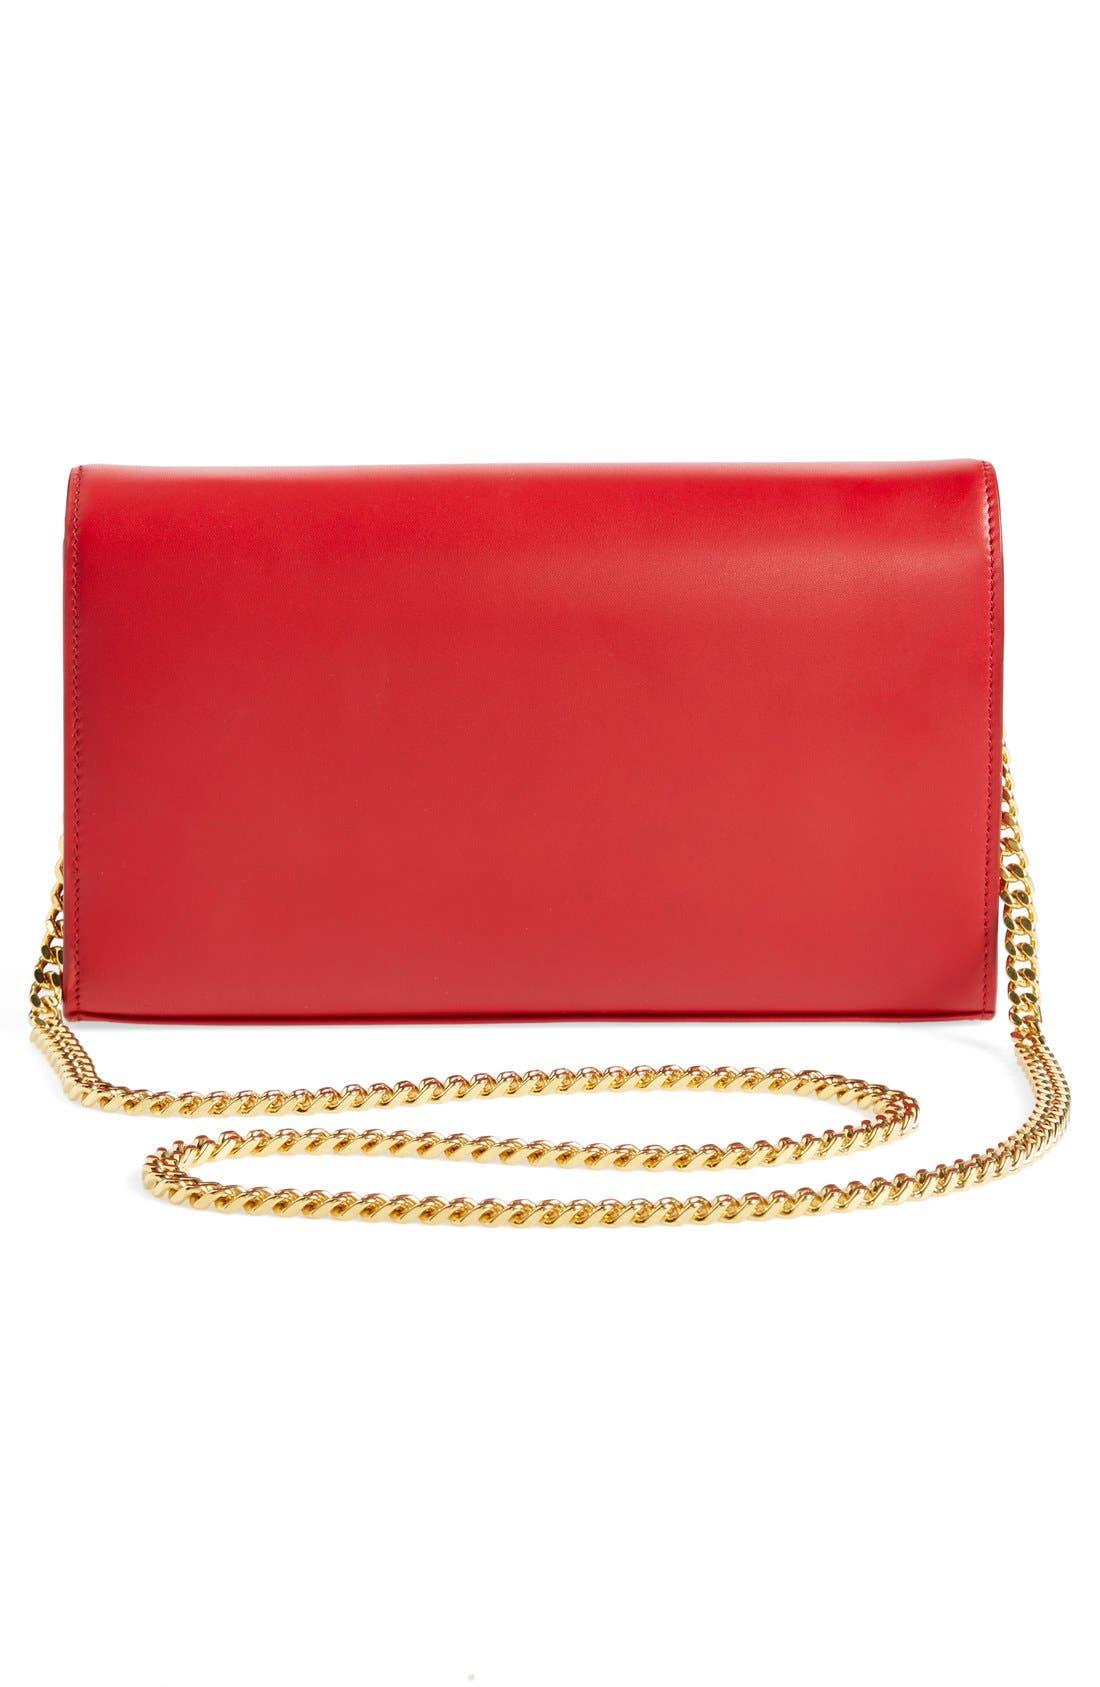 Alternate Image 3  - Saint Laurent 'Monogram' Leather Wallet on a Chain